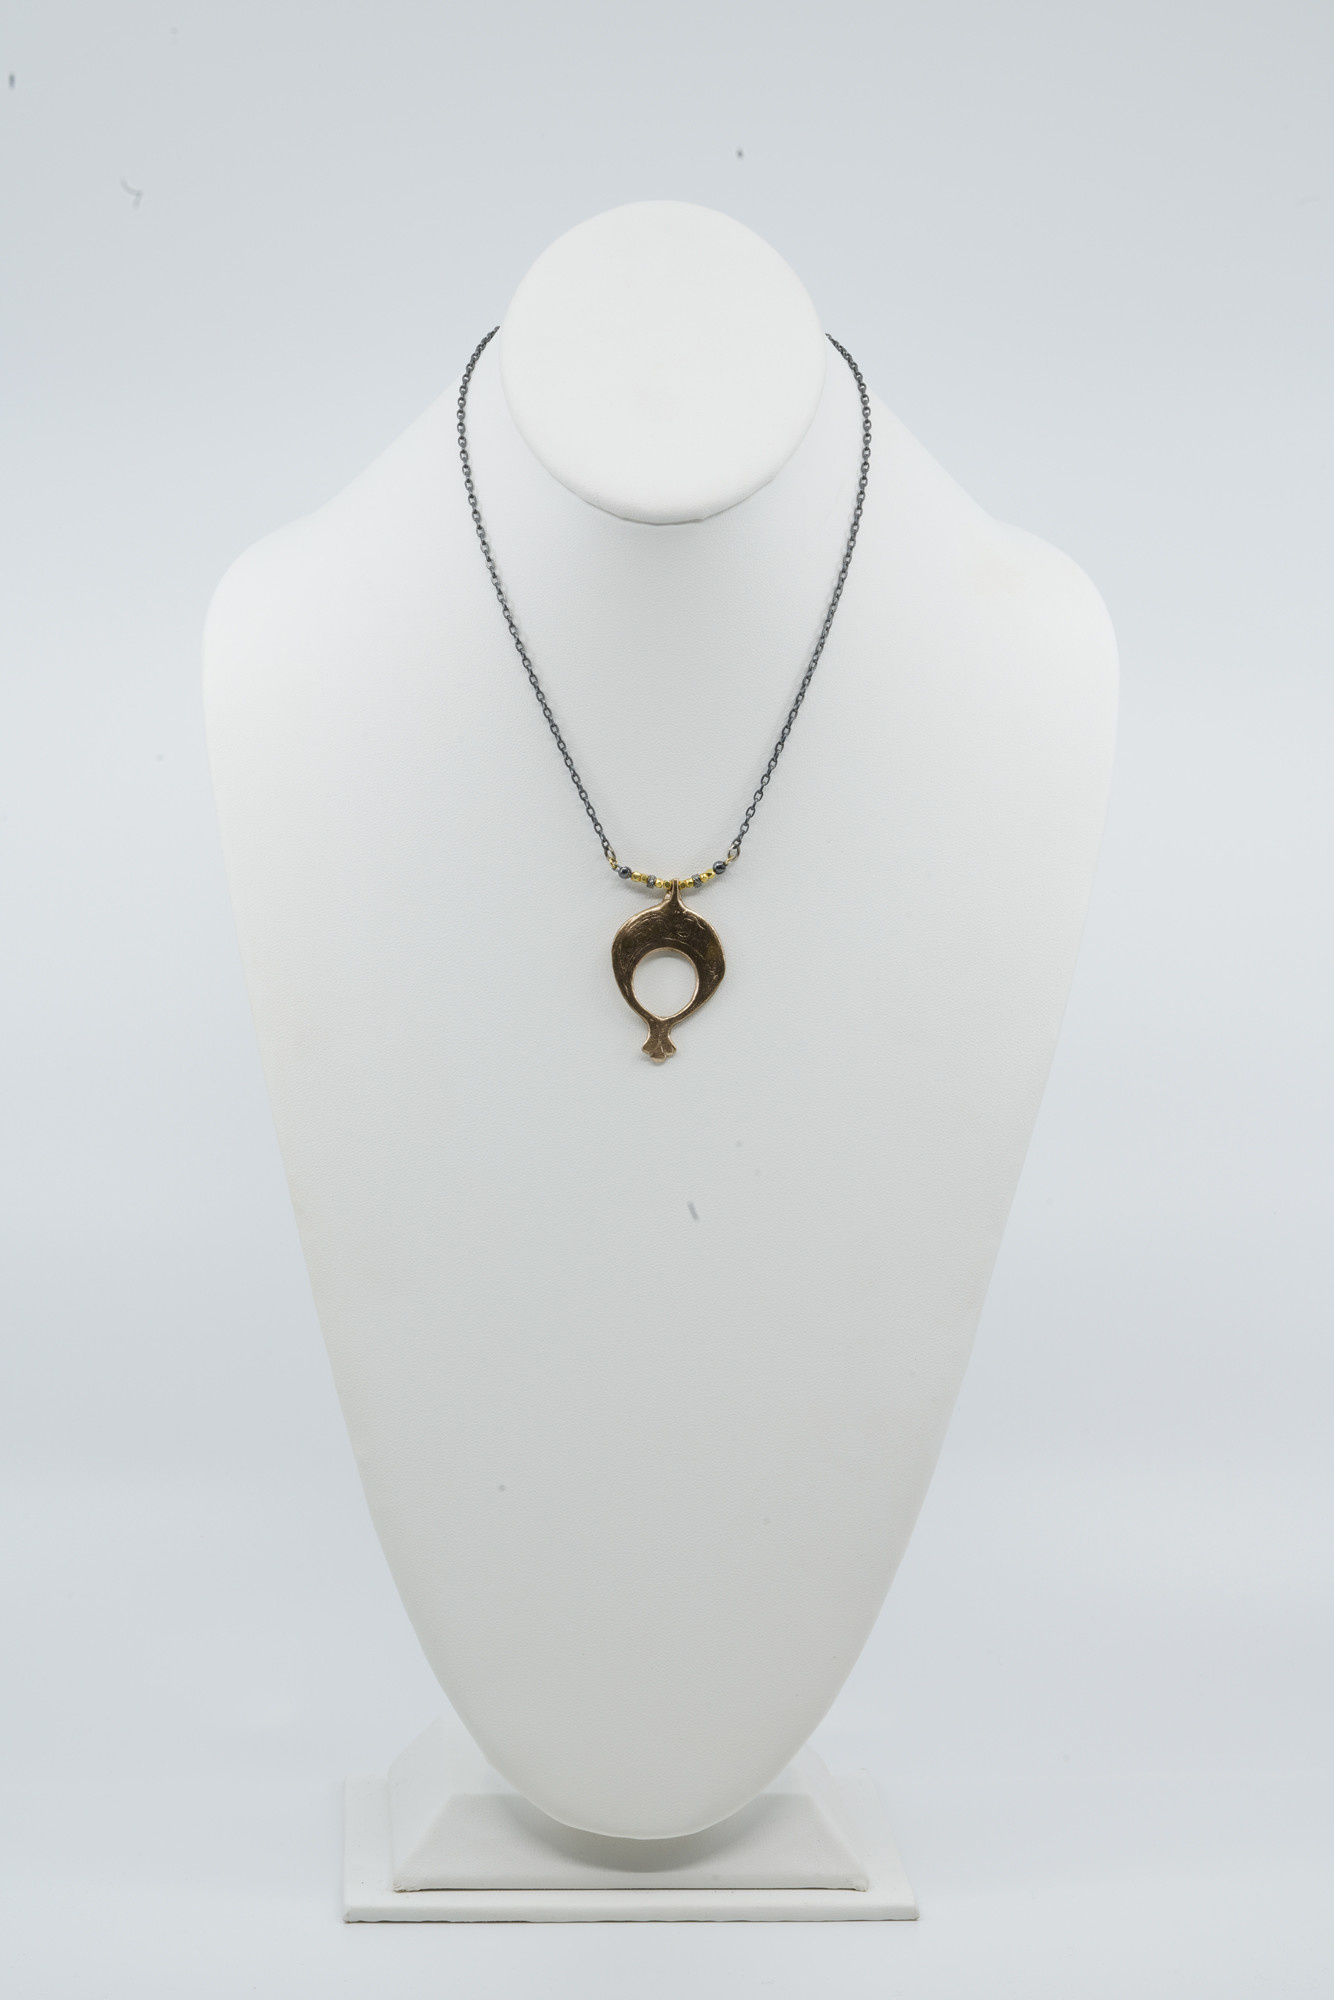 Bronze Ethiopian Pendant Necklace